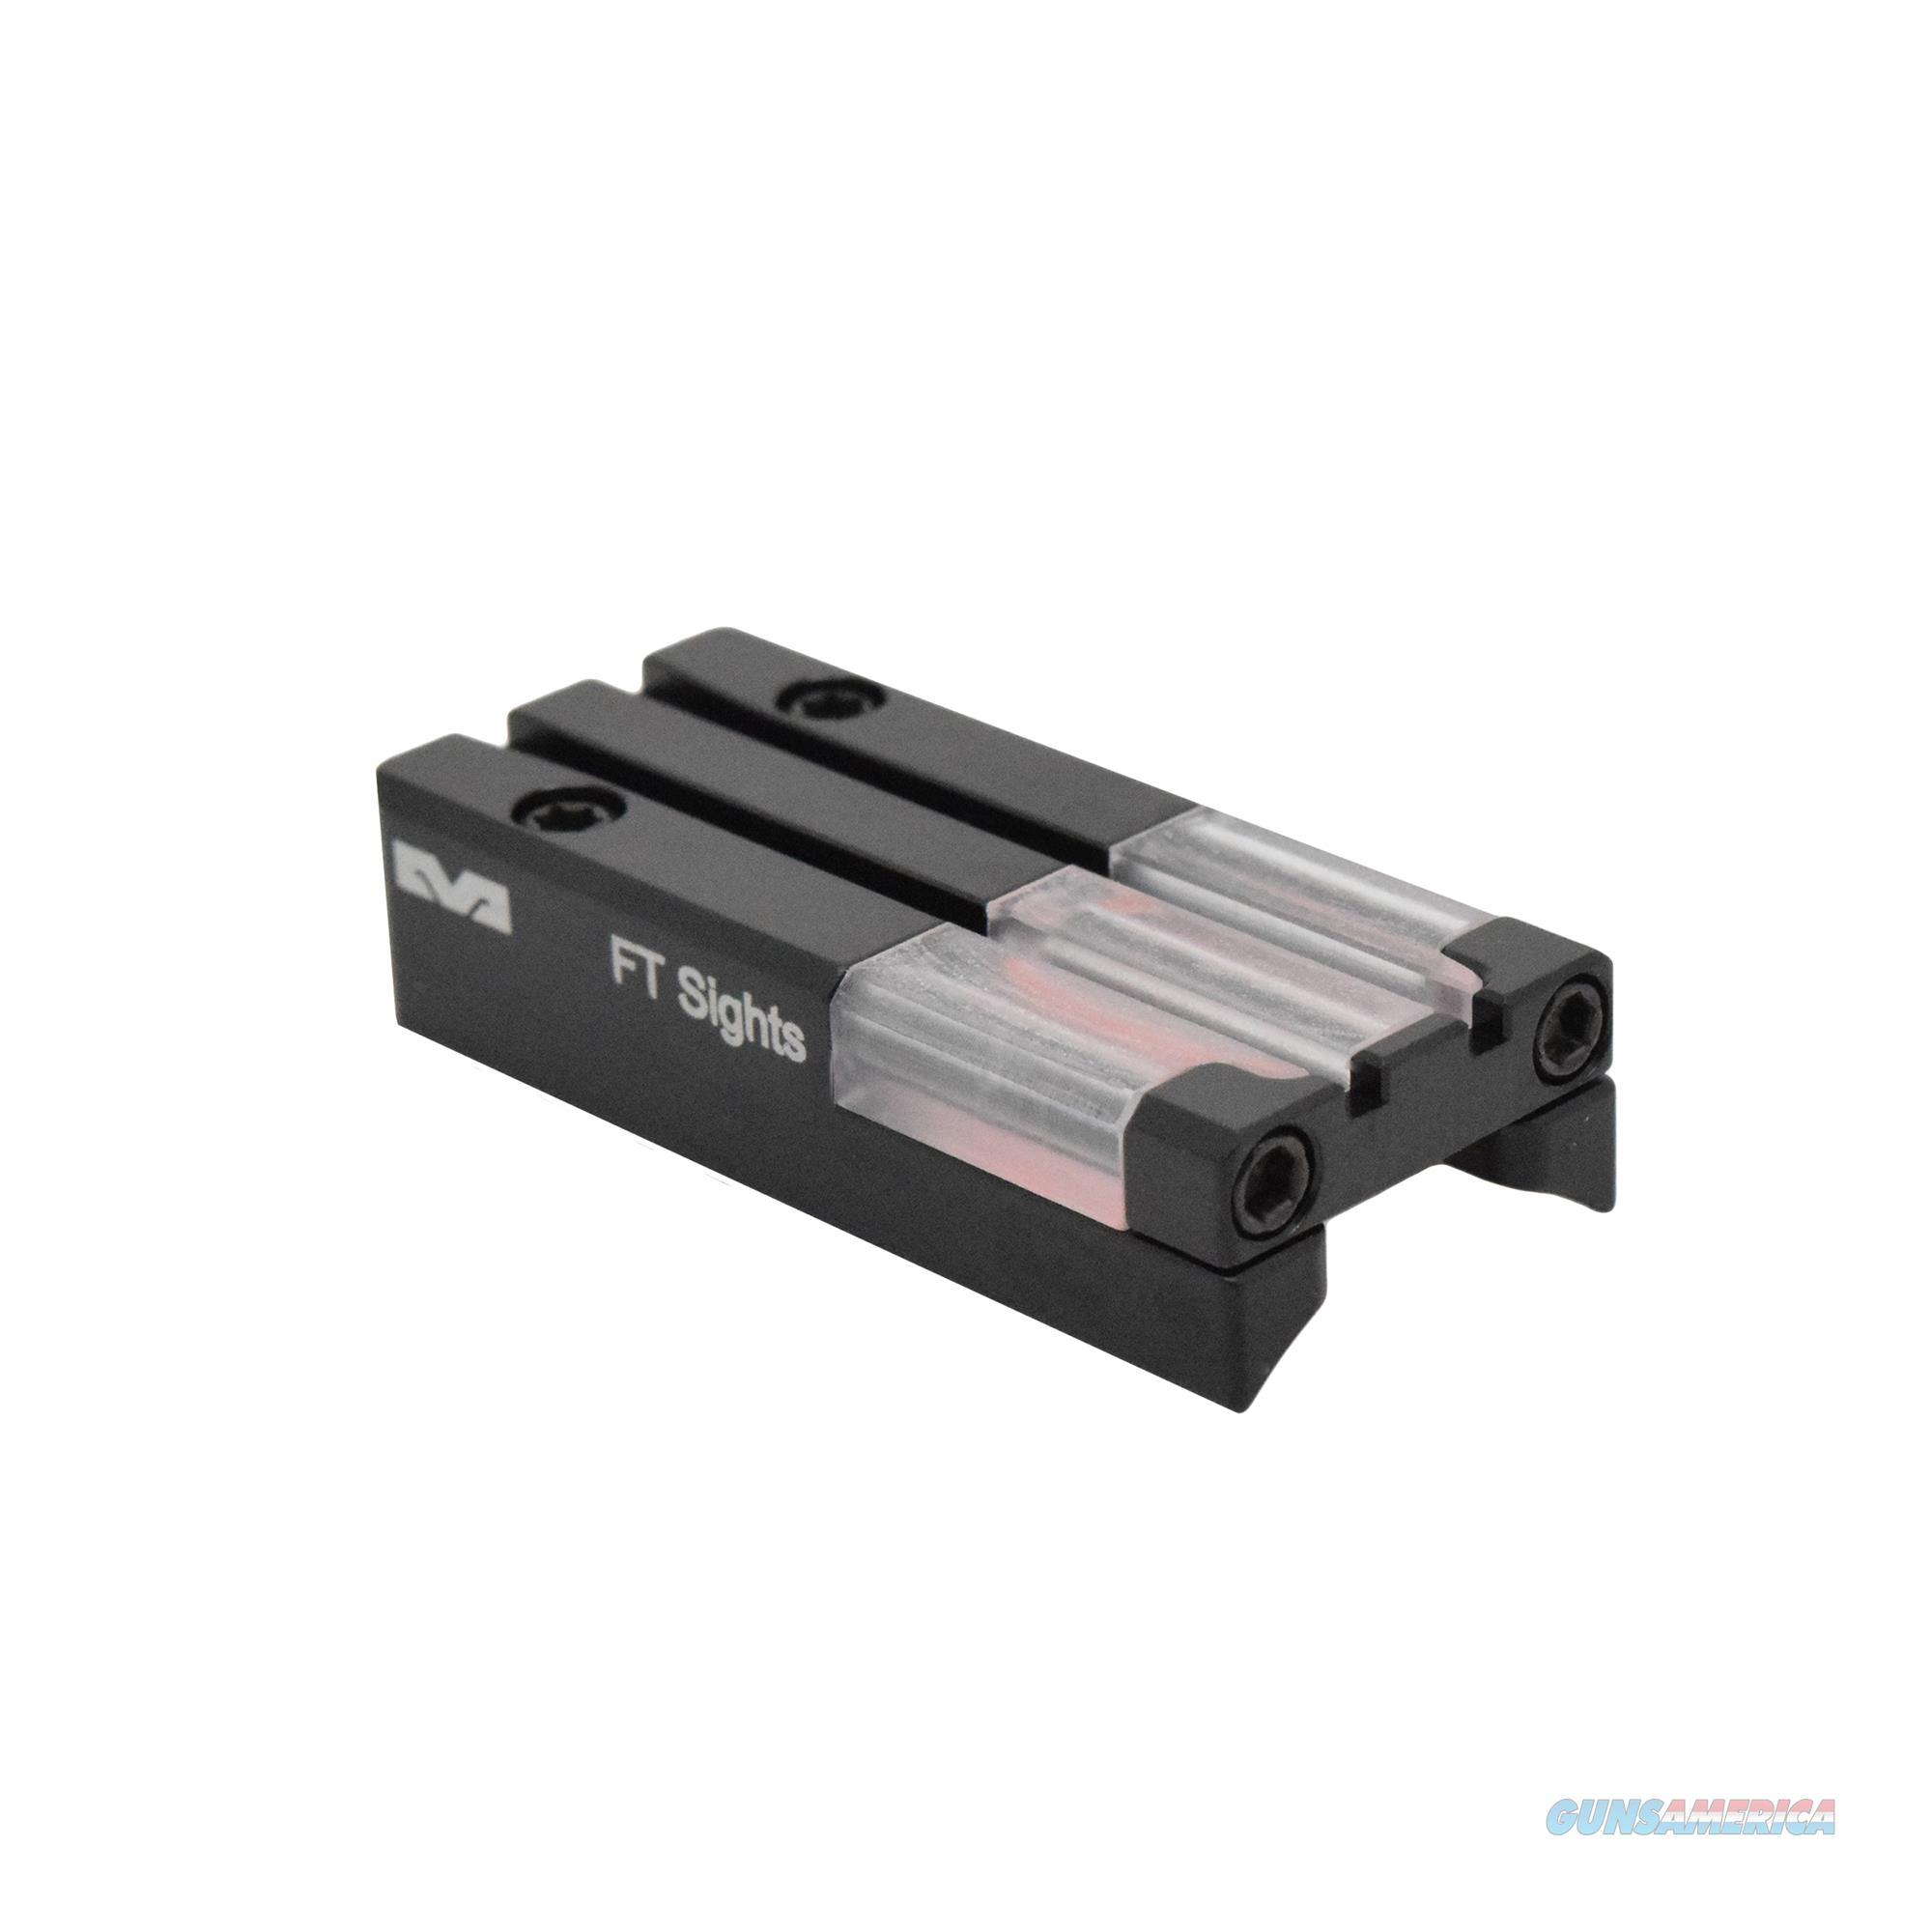 Meprolight Fiber-Tritium Bullseye Sight ML63145R  Non-Guns > Iron/Metal/Peep Sights